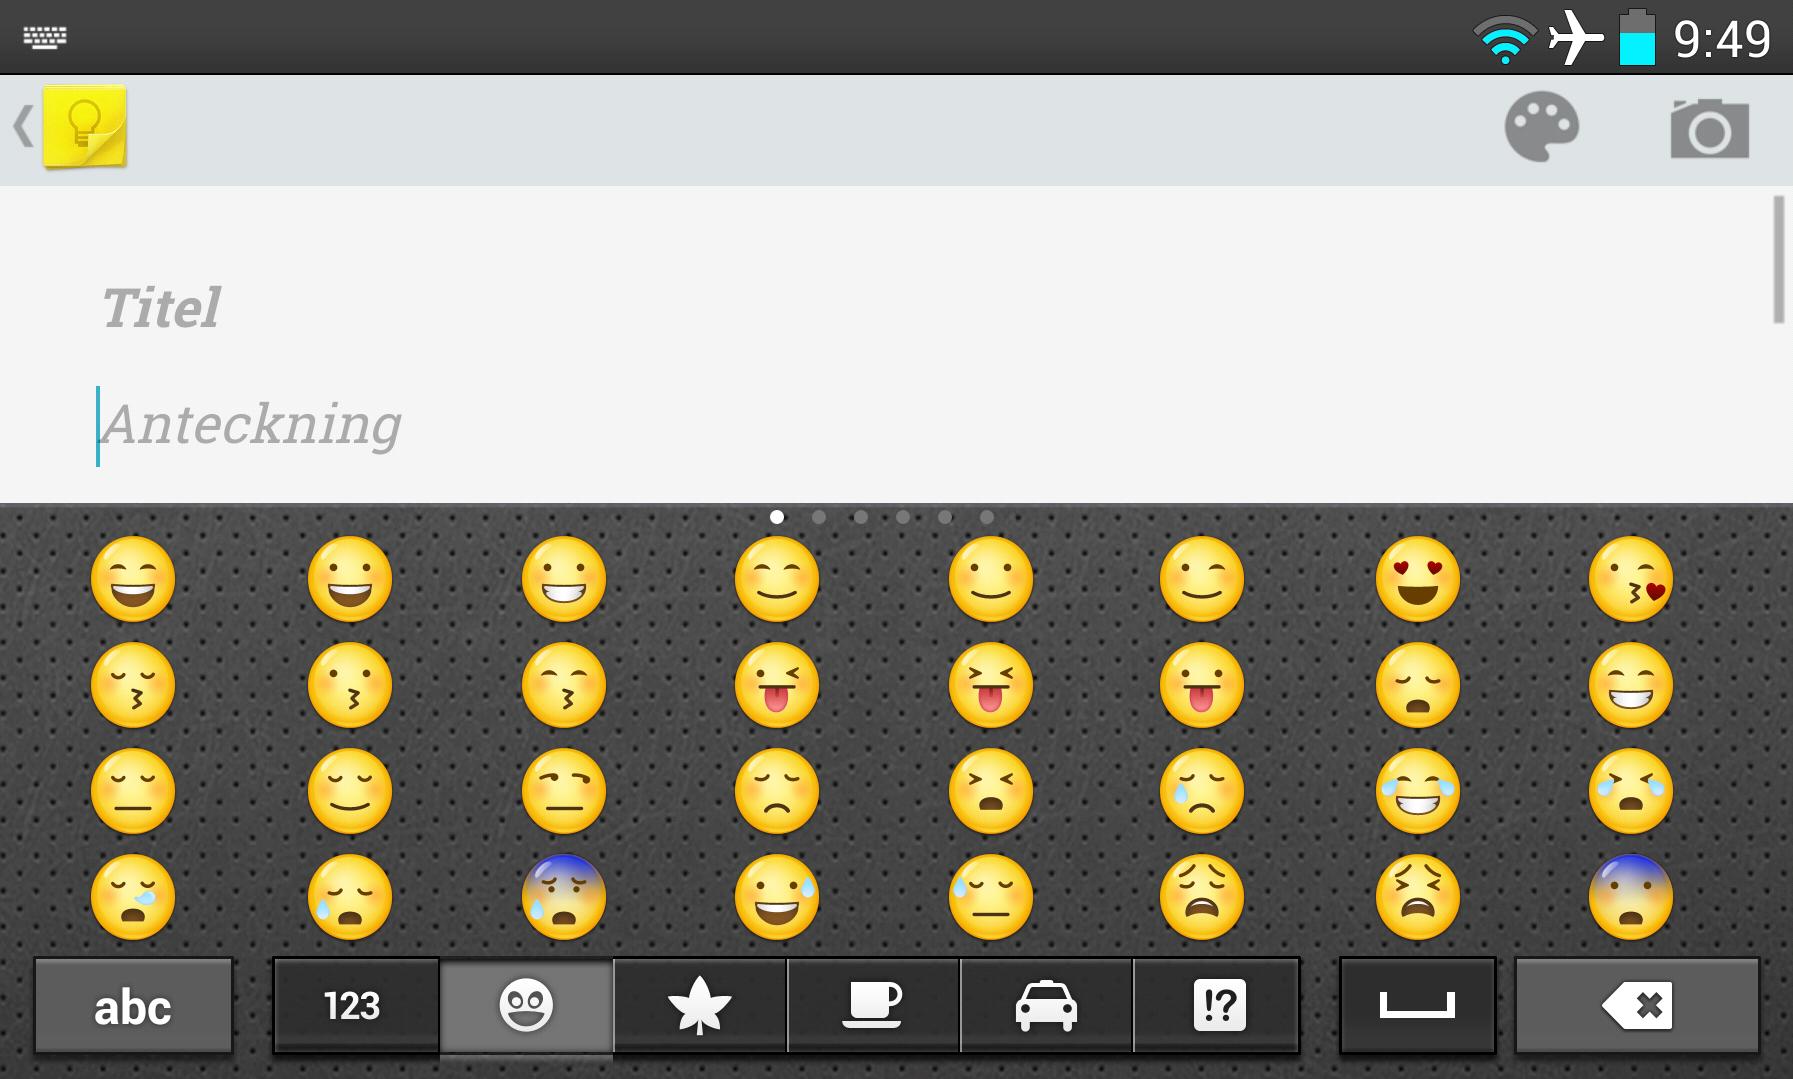 Image Gallery Lg Emojis